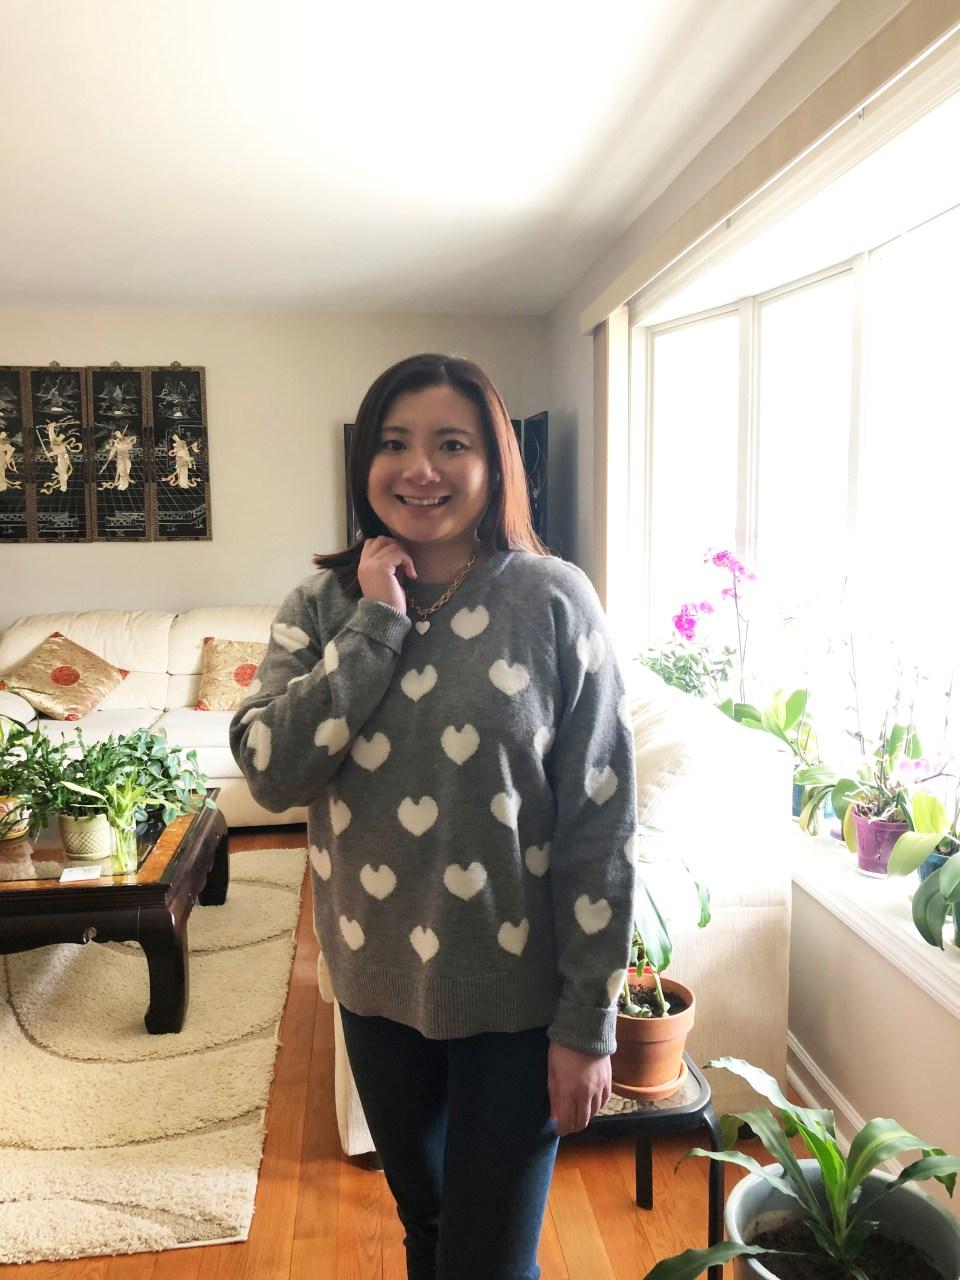 White Heart Sweater 4